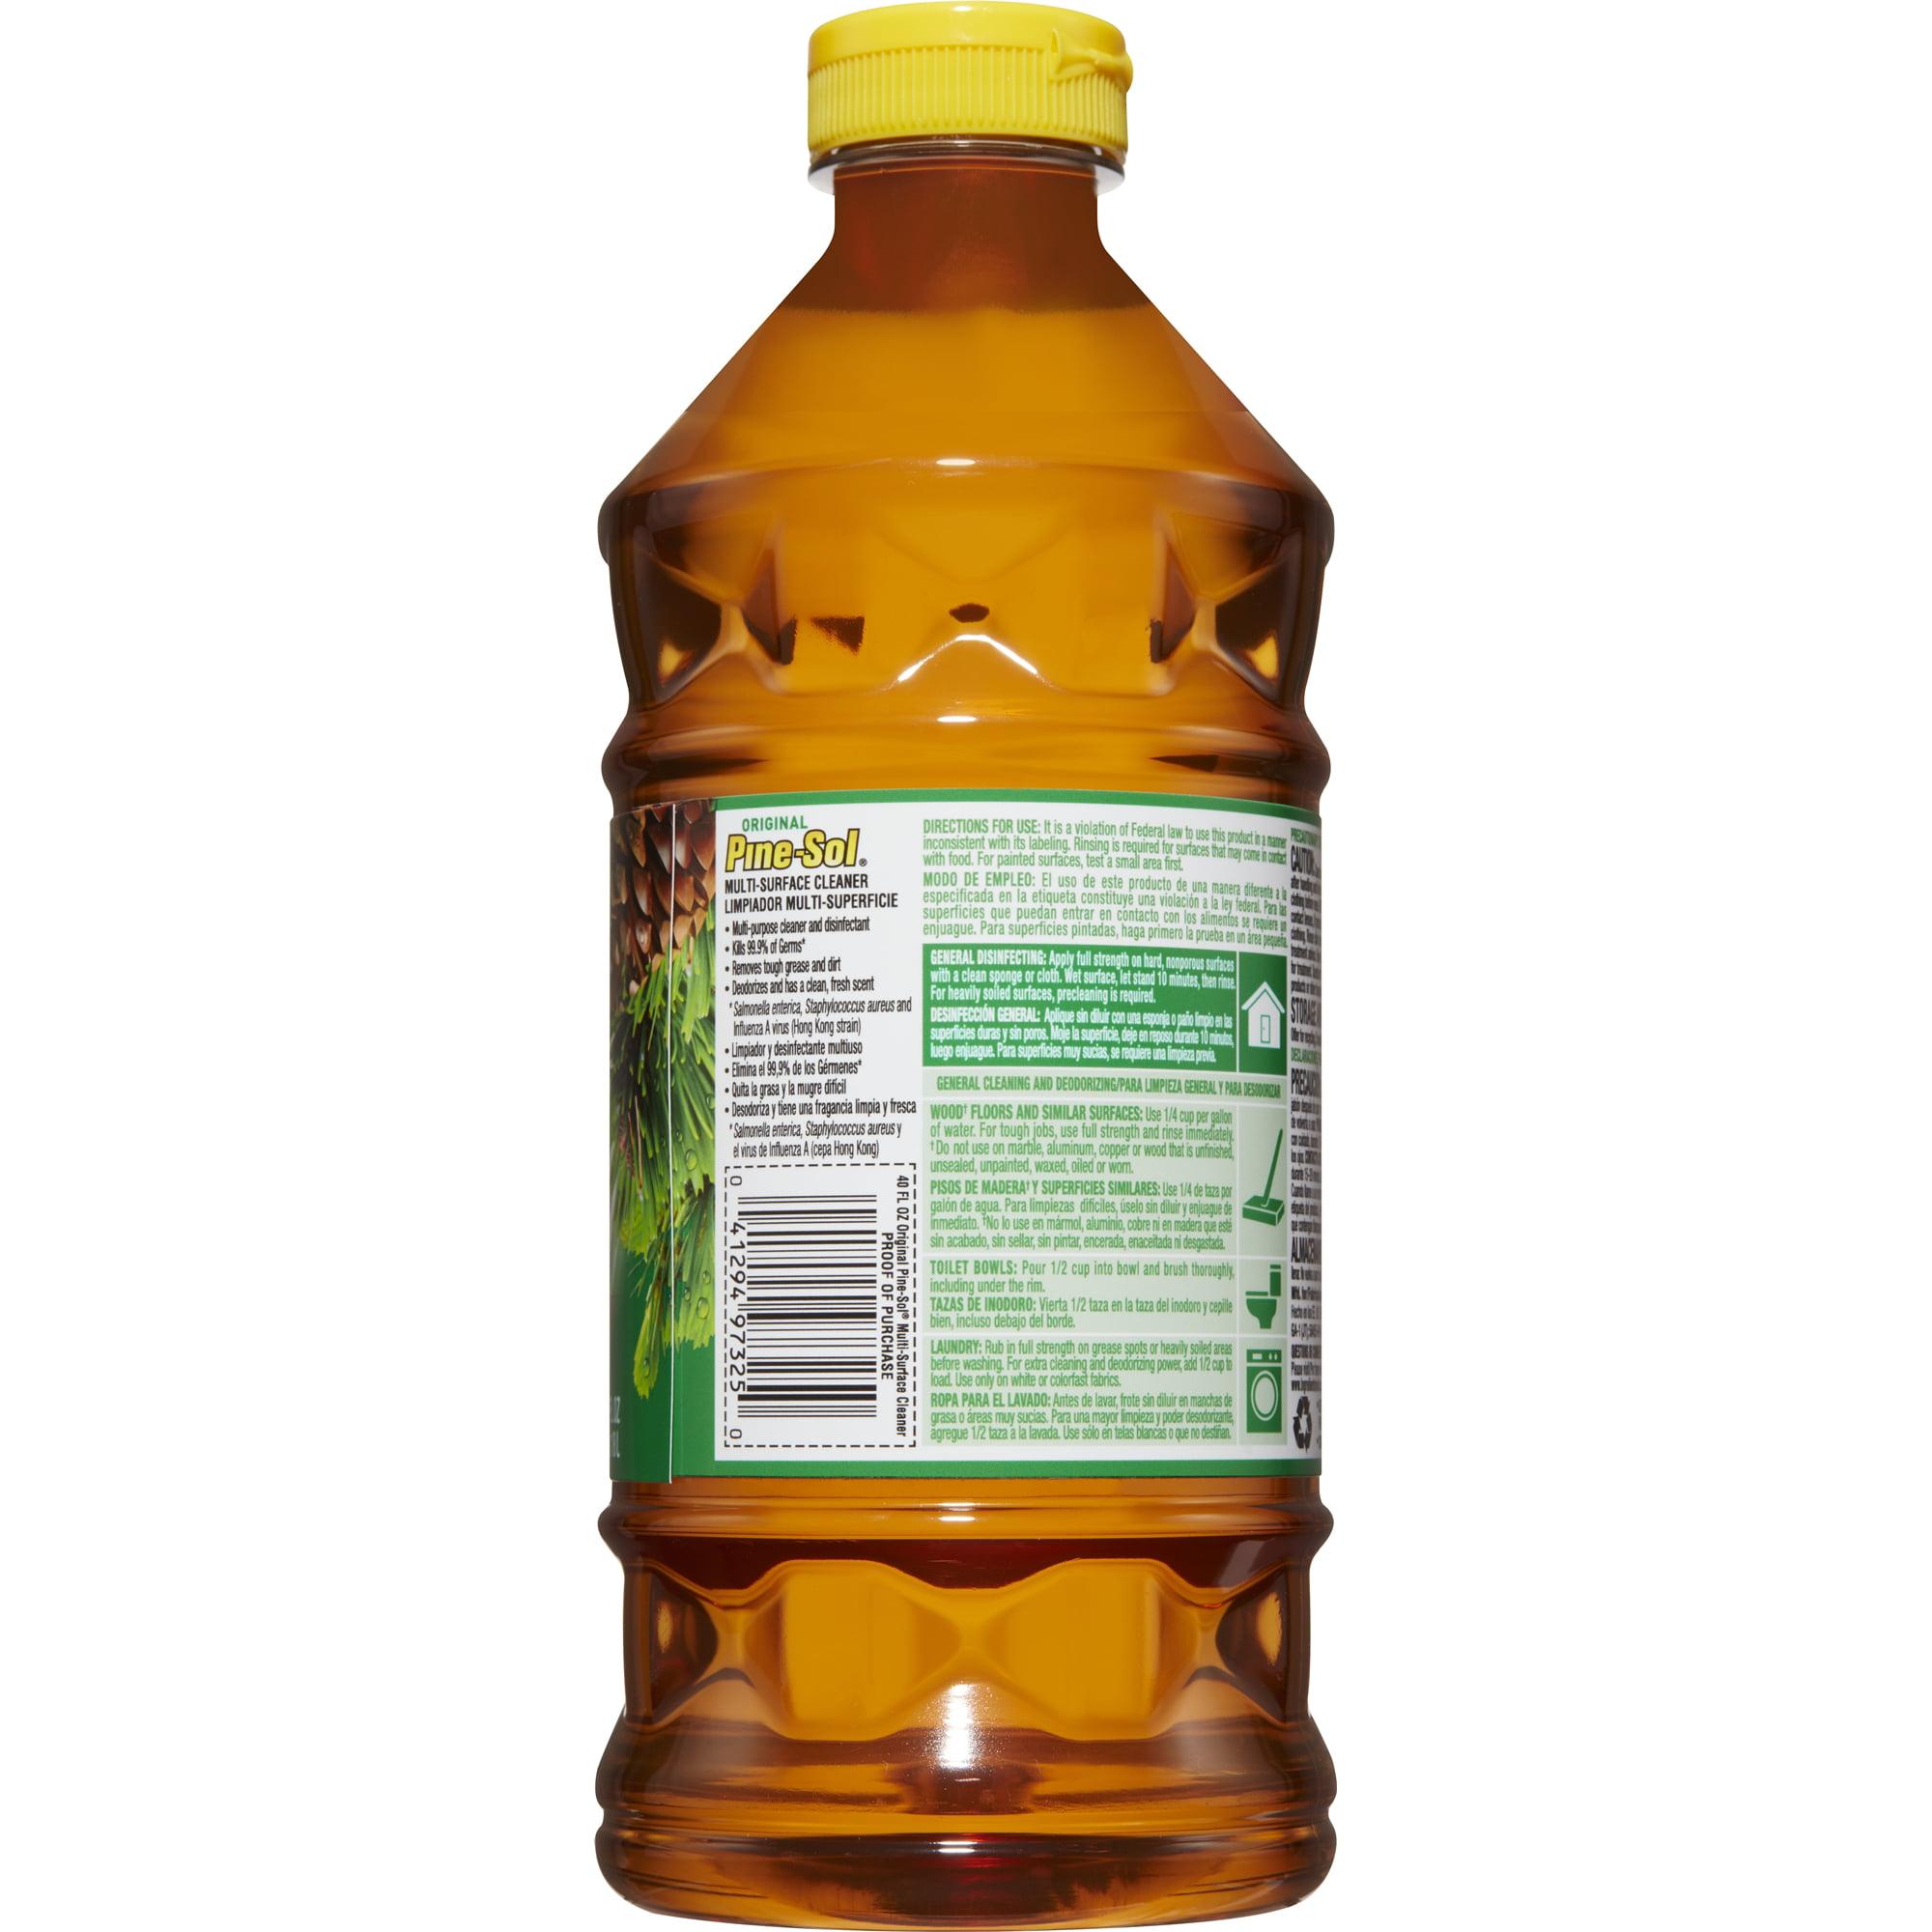 PineSol MultiSurface Cleaner Original Oz Bottle Walmartcom - Pine sol for vinyl floors